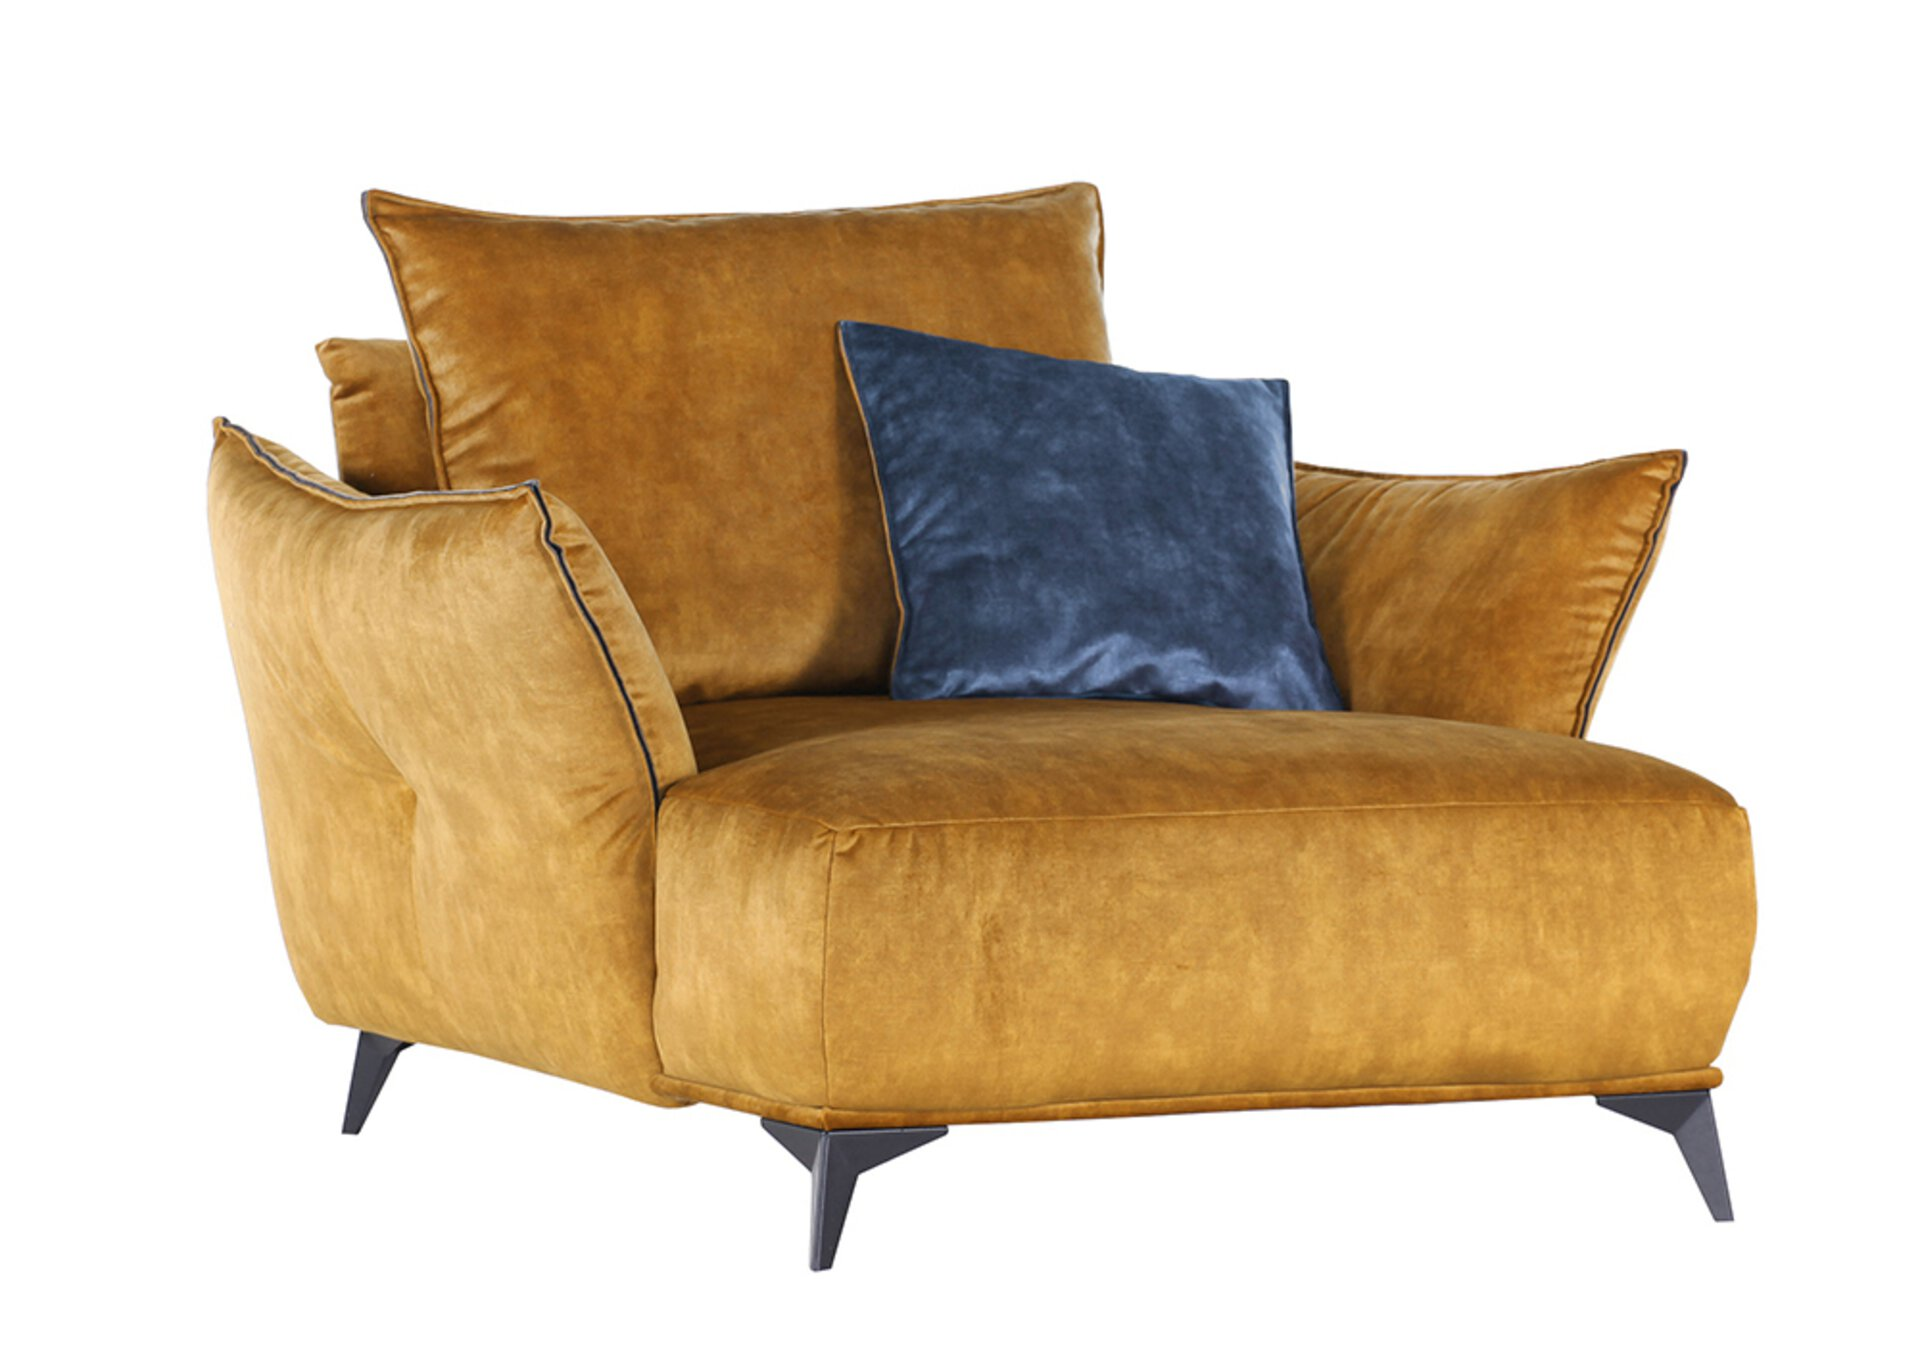 Einzelsessel ENJOY Gutmann Factory Textil 134 x 84 x 125 cm